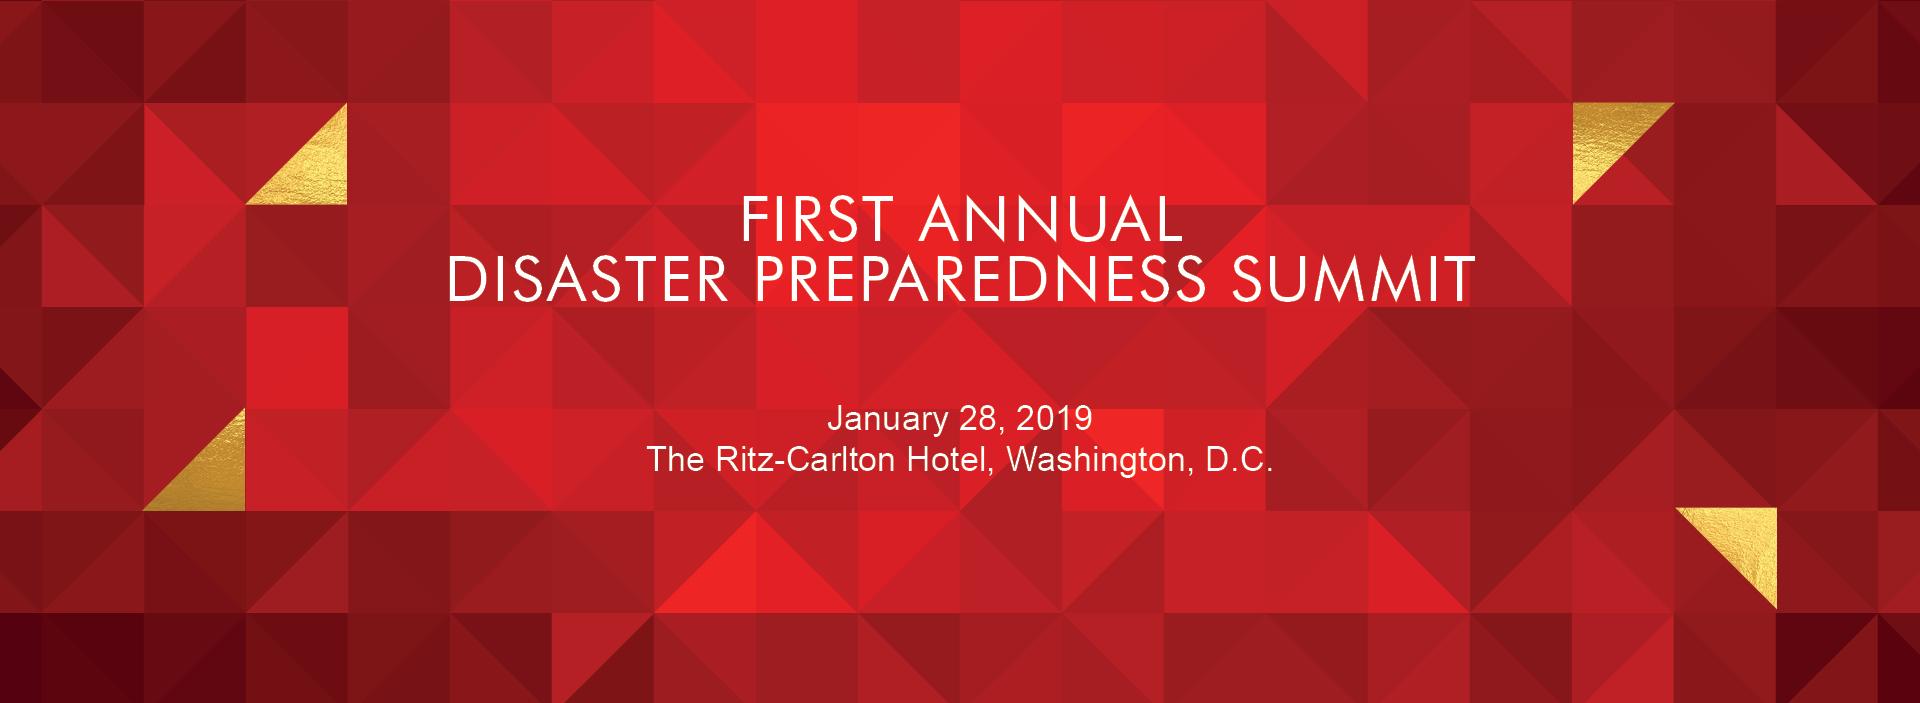 Disaster Preparedness Summit: A Ready Mindset